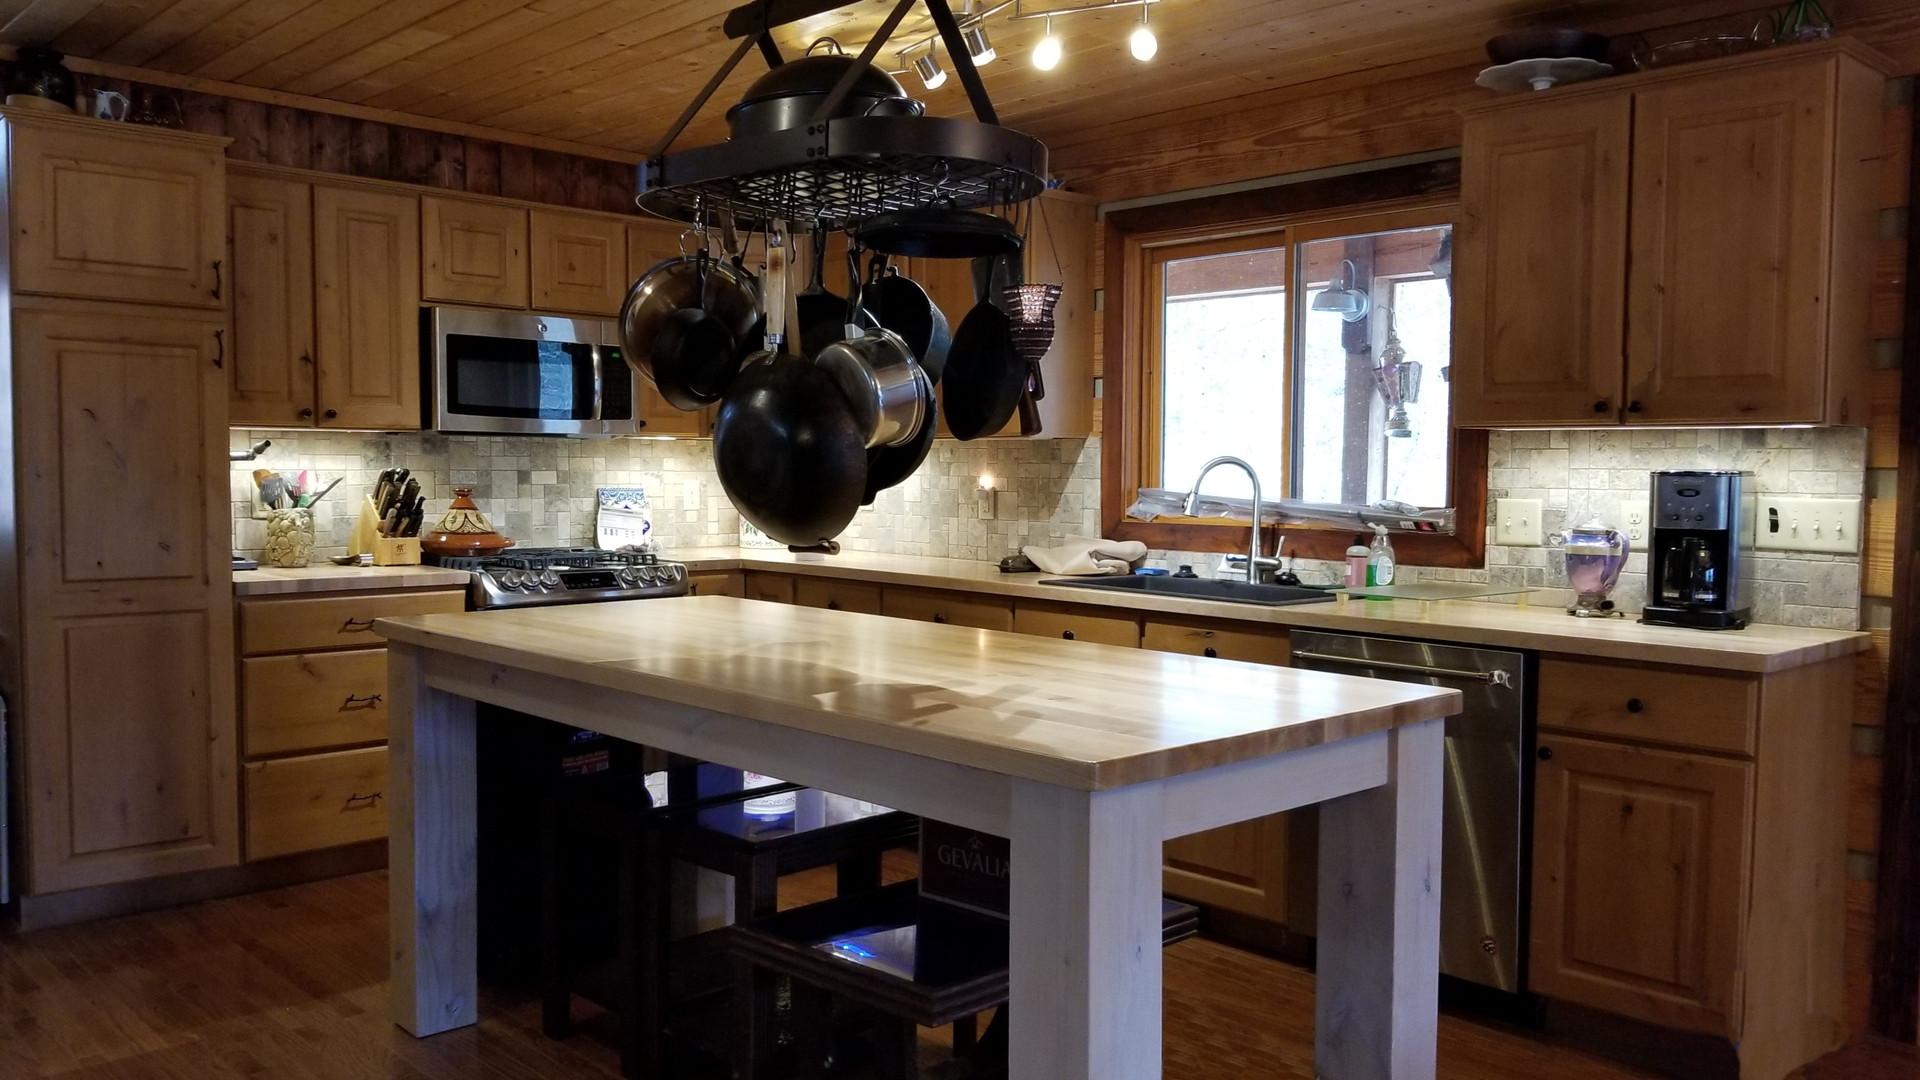 serafini kitchen edited.jpg